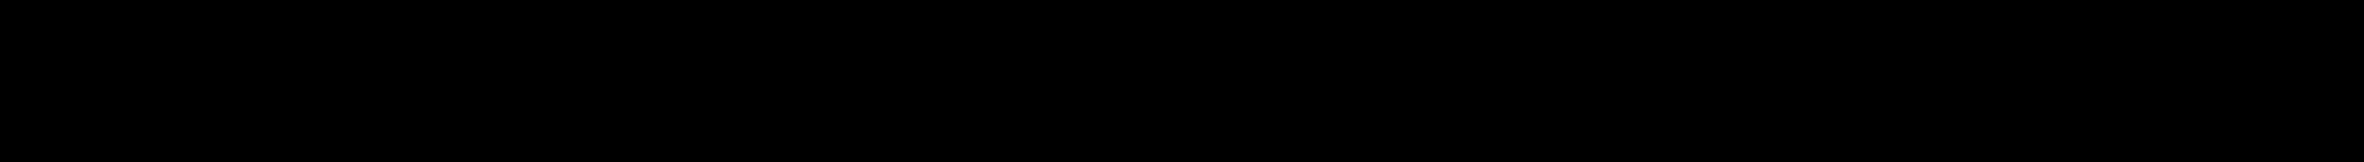 TEXT LOGO BLACK(1).png